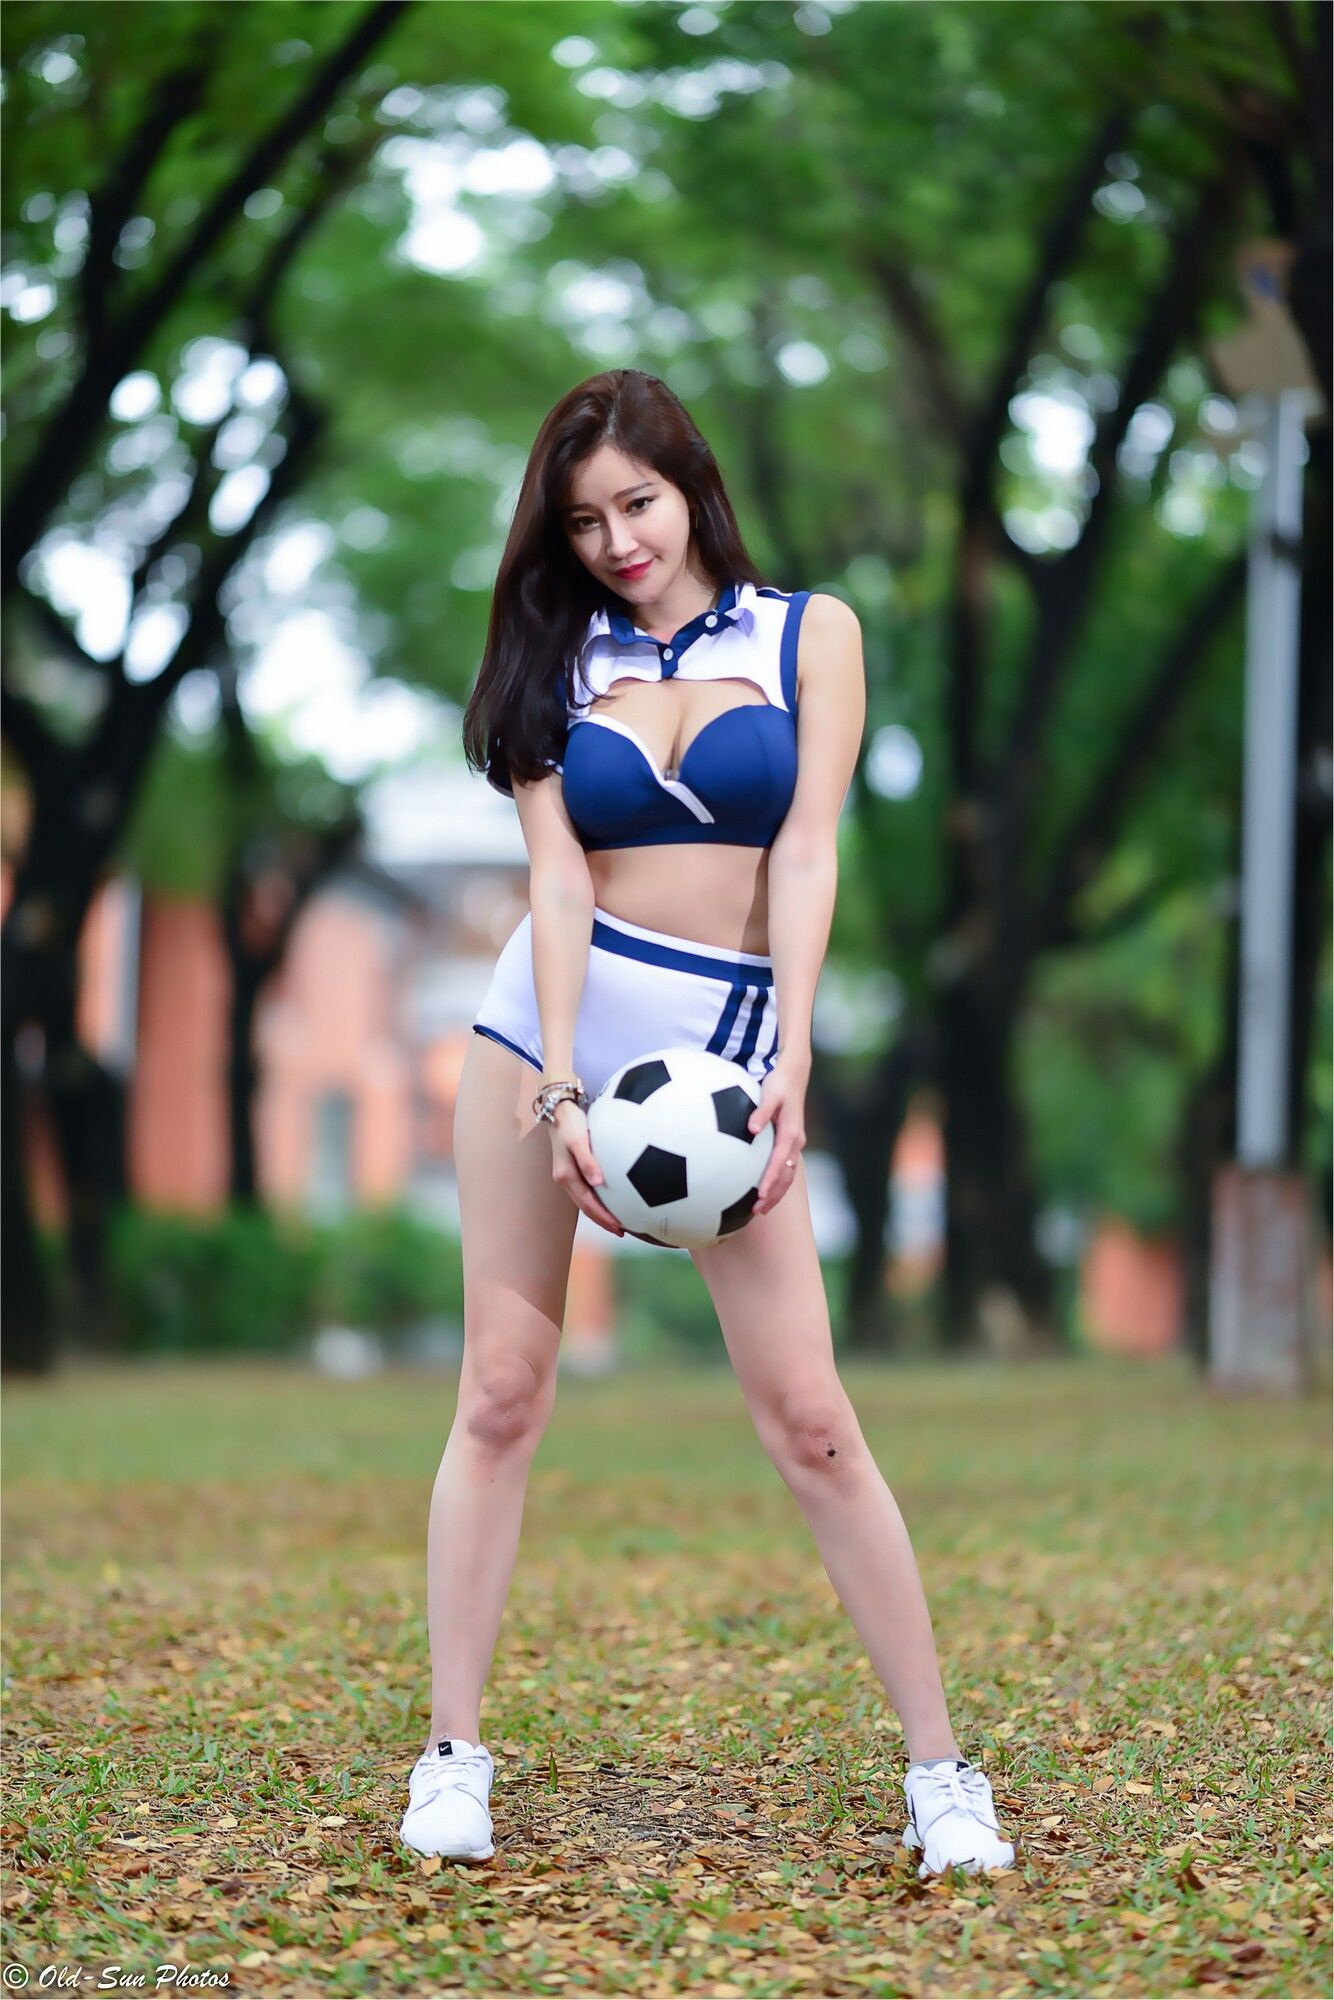 VOL.734 [台湾正妹]妹子足球宝贝:詹艾葳(腿模Avril,腿模Arvil)超高清个人性感漂亮大图(83P)